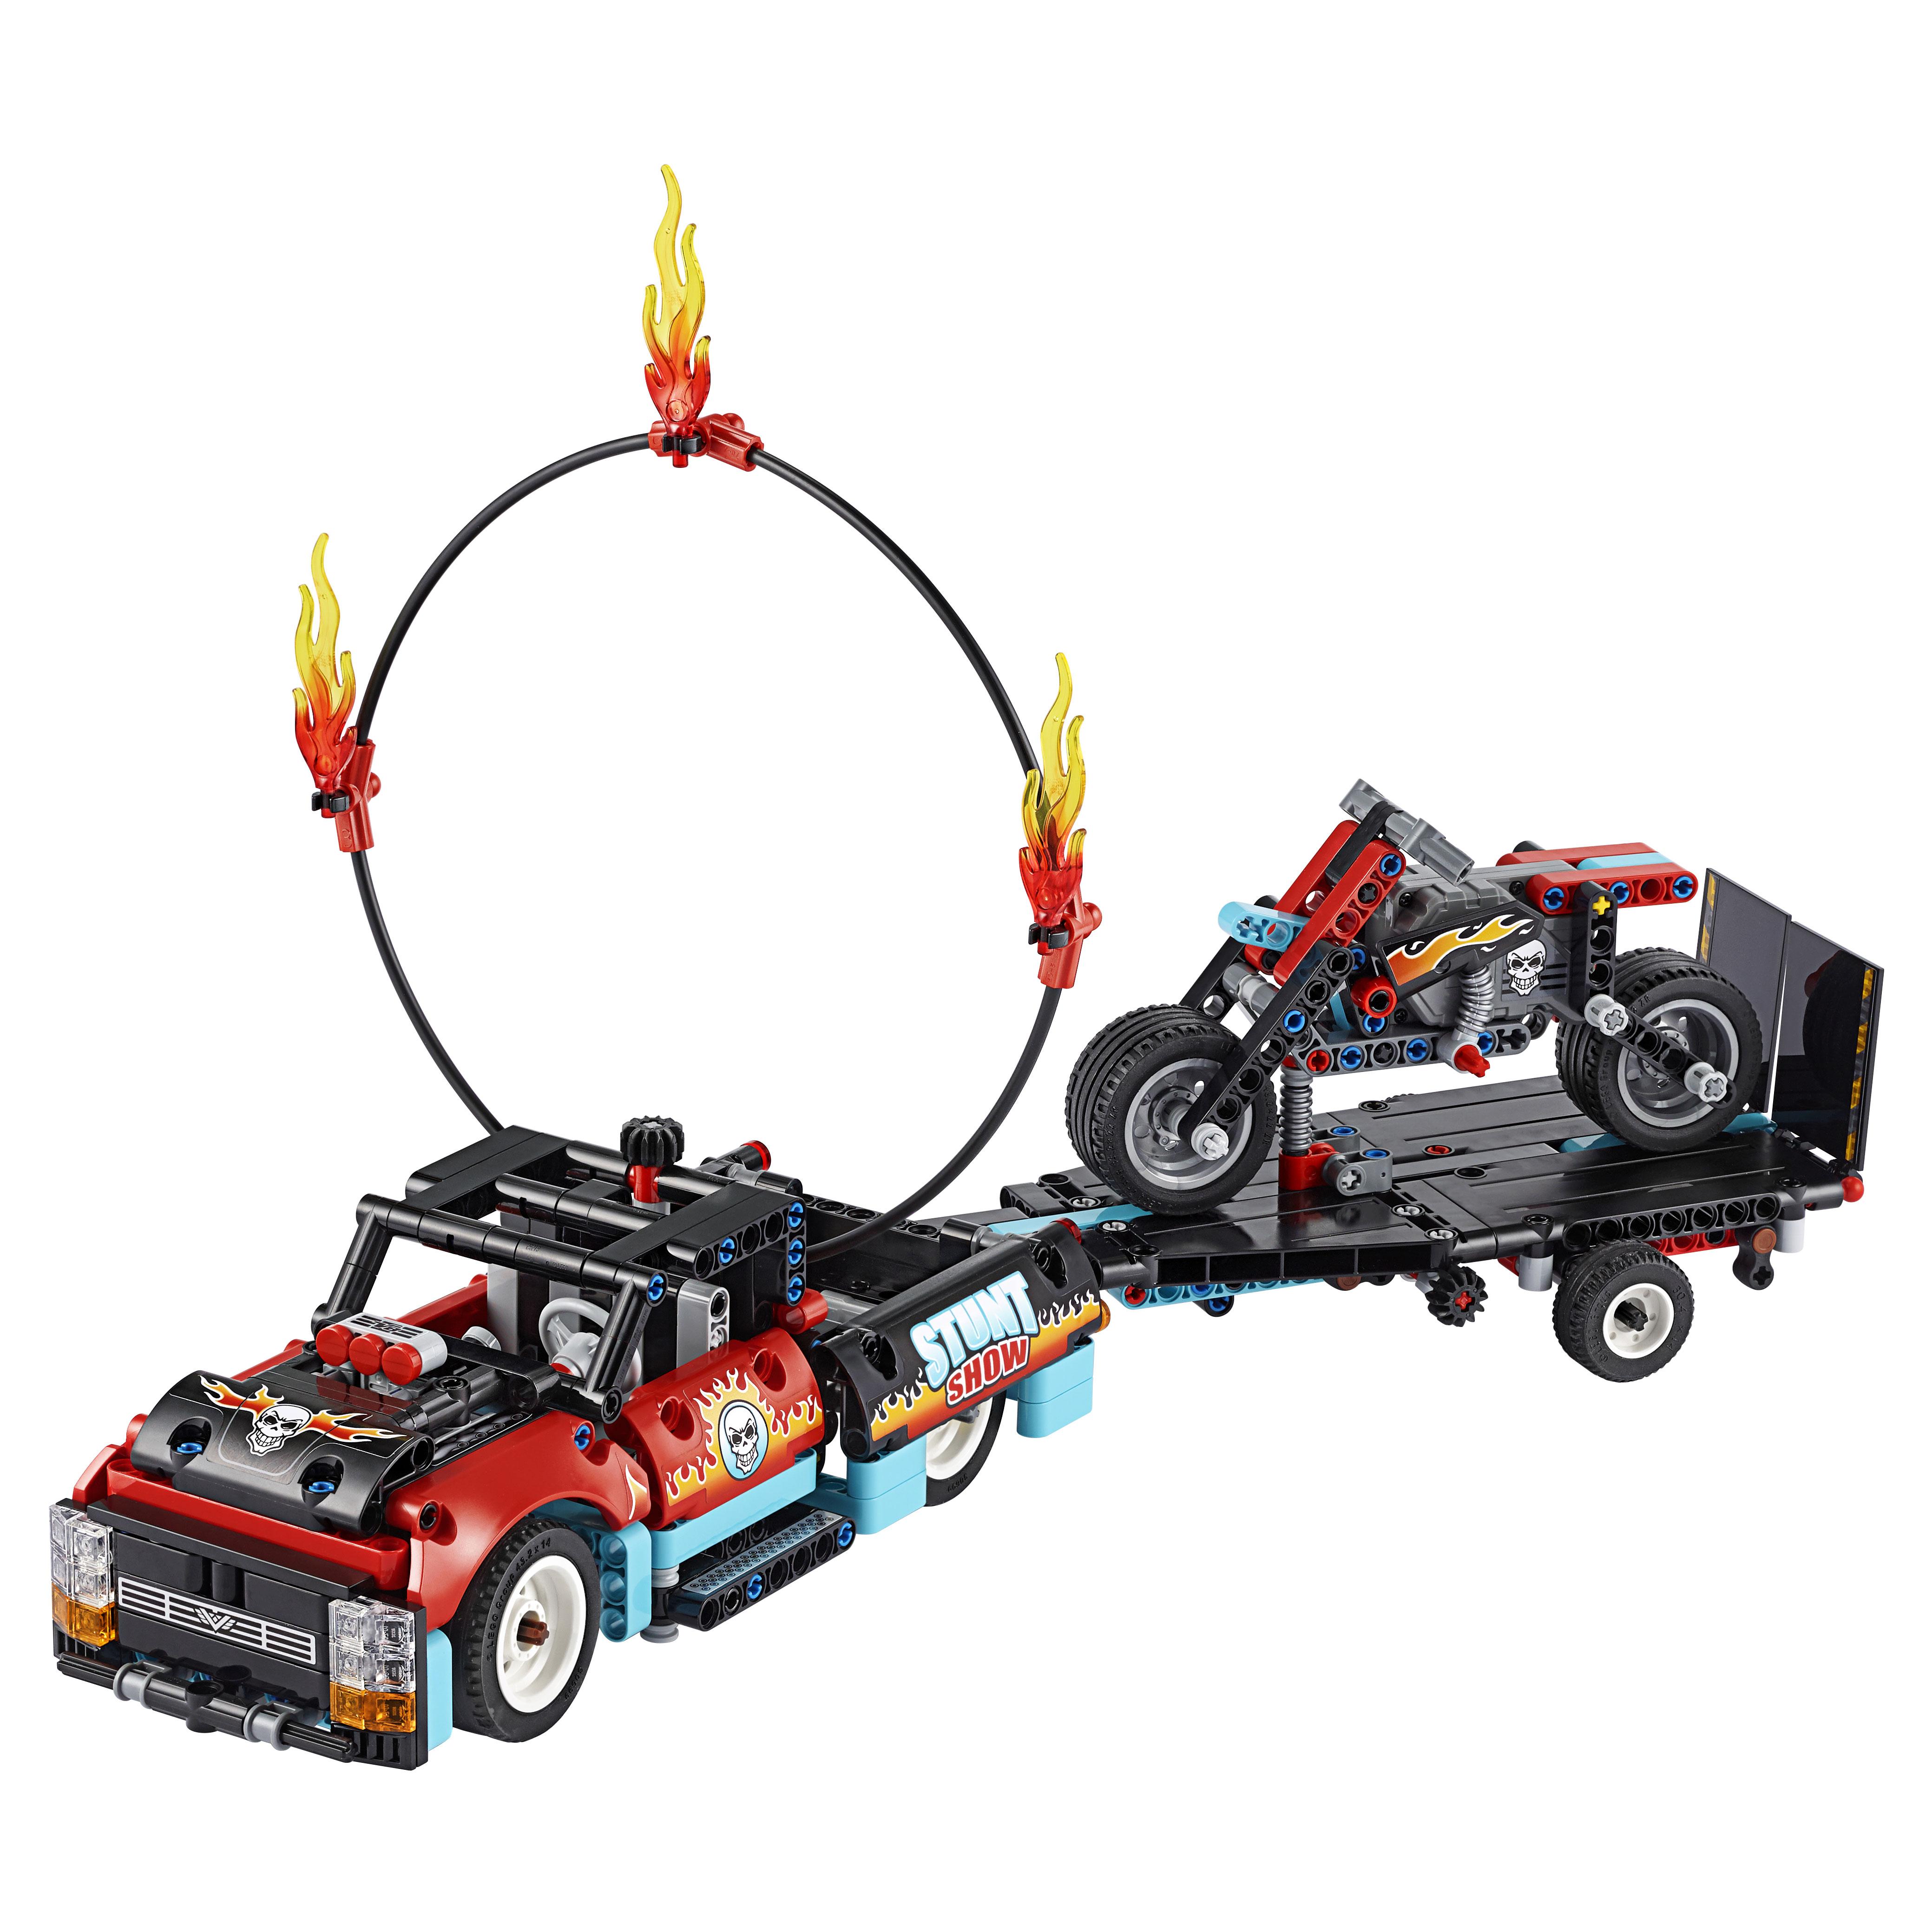 Конструктор LEGO Technic 42106 Шоу трюков